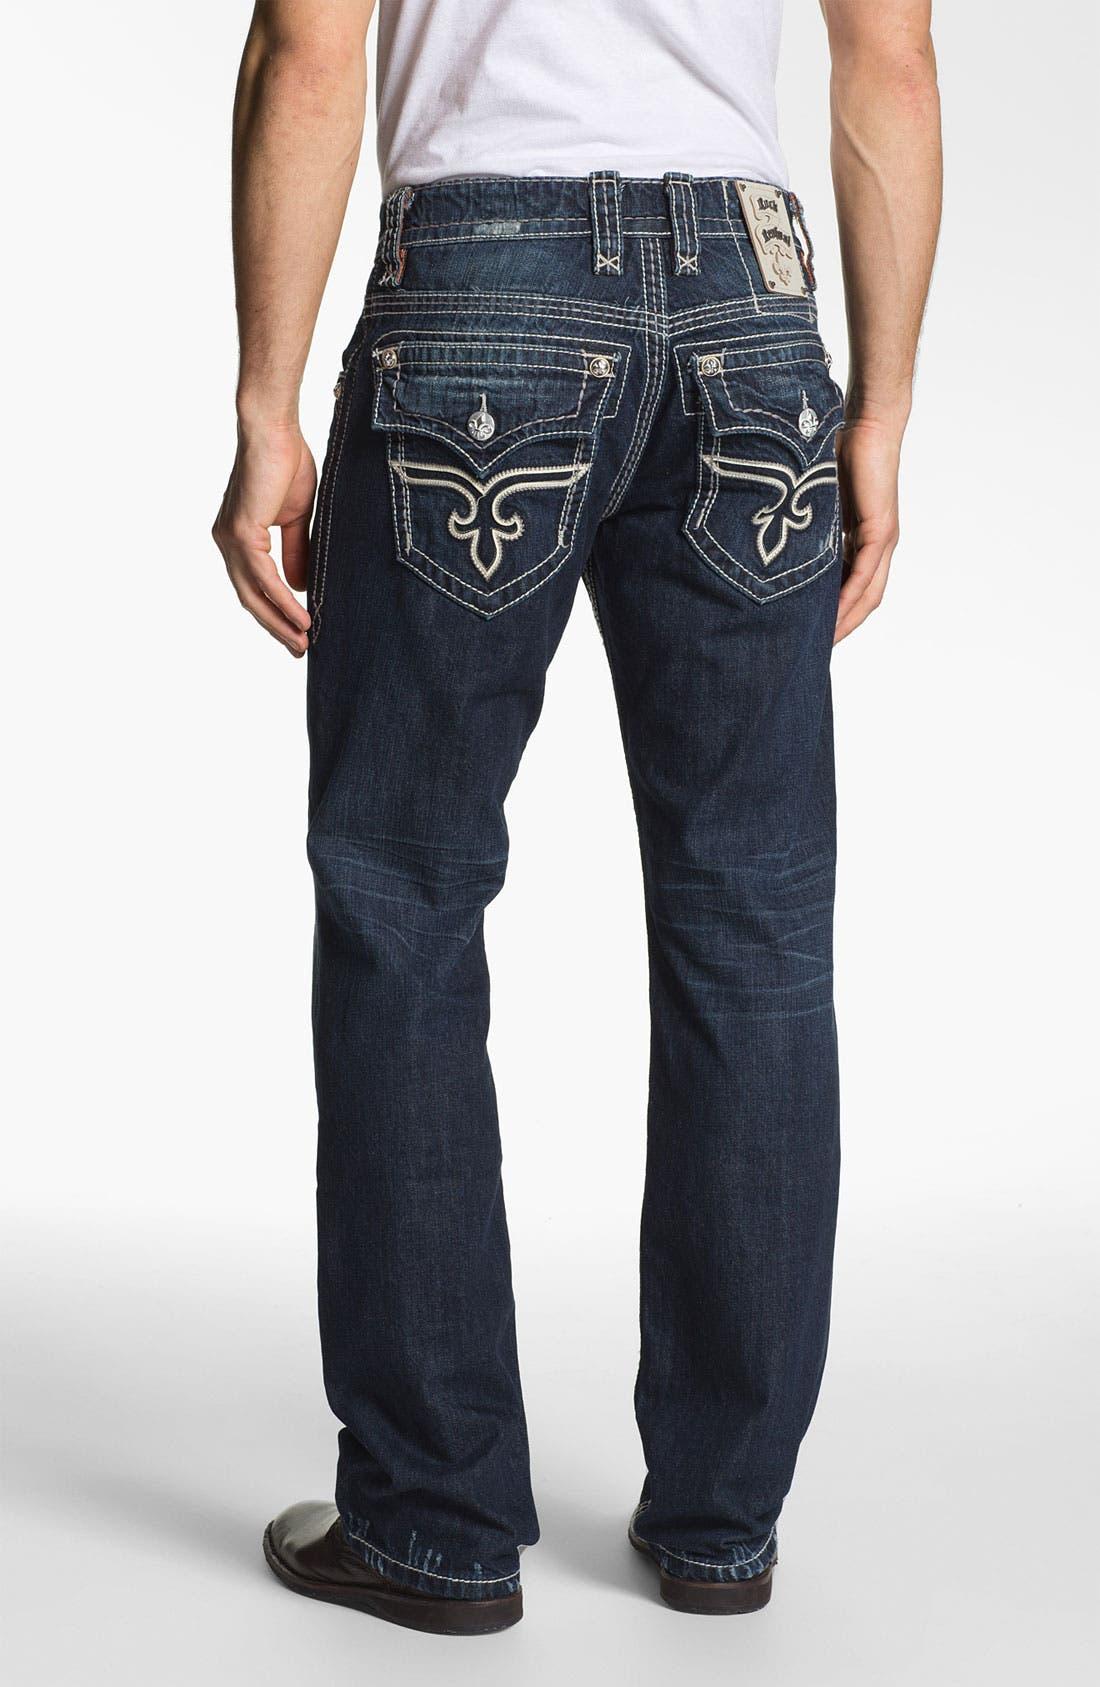 Alternate Image 1 Selected - Rock Revival 'Alec' Straight Leg Jeans (Dark Blue)